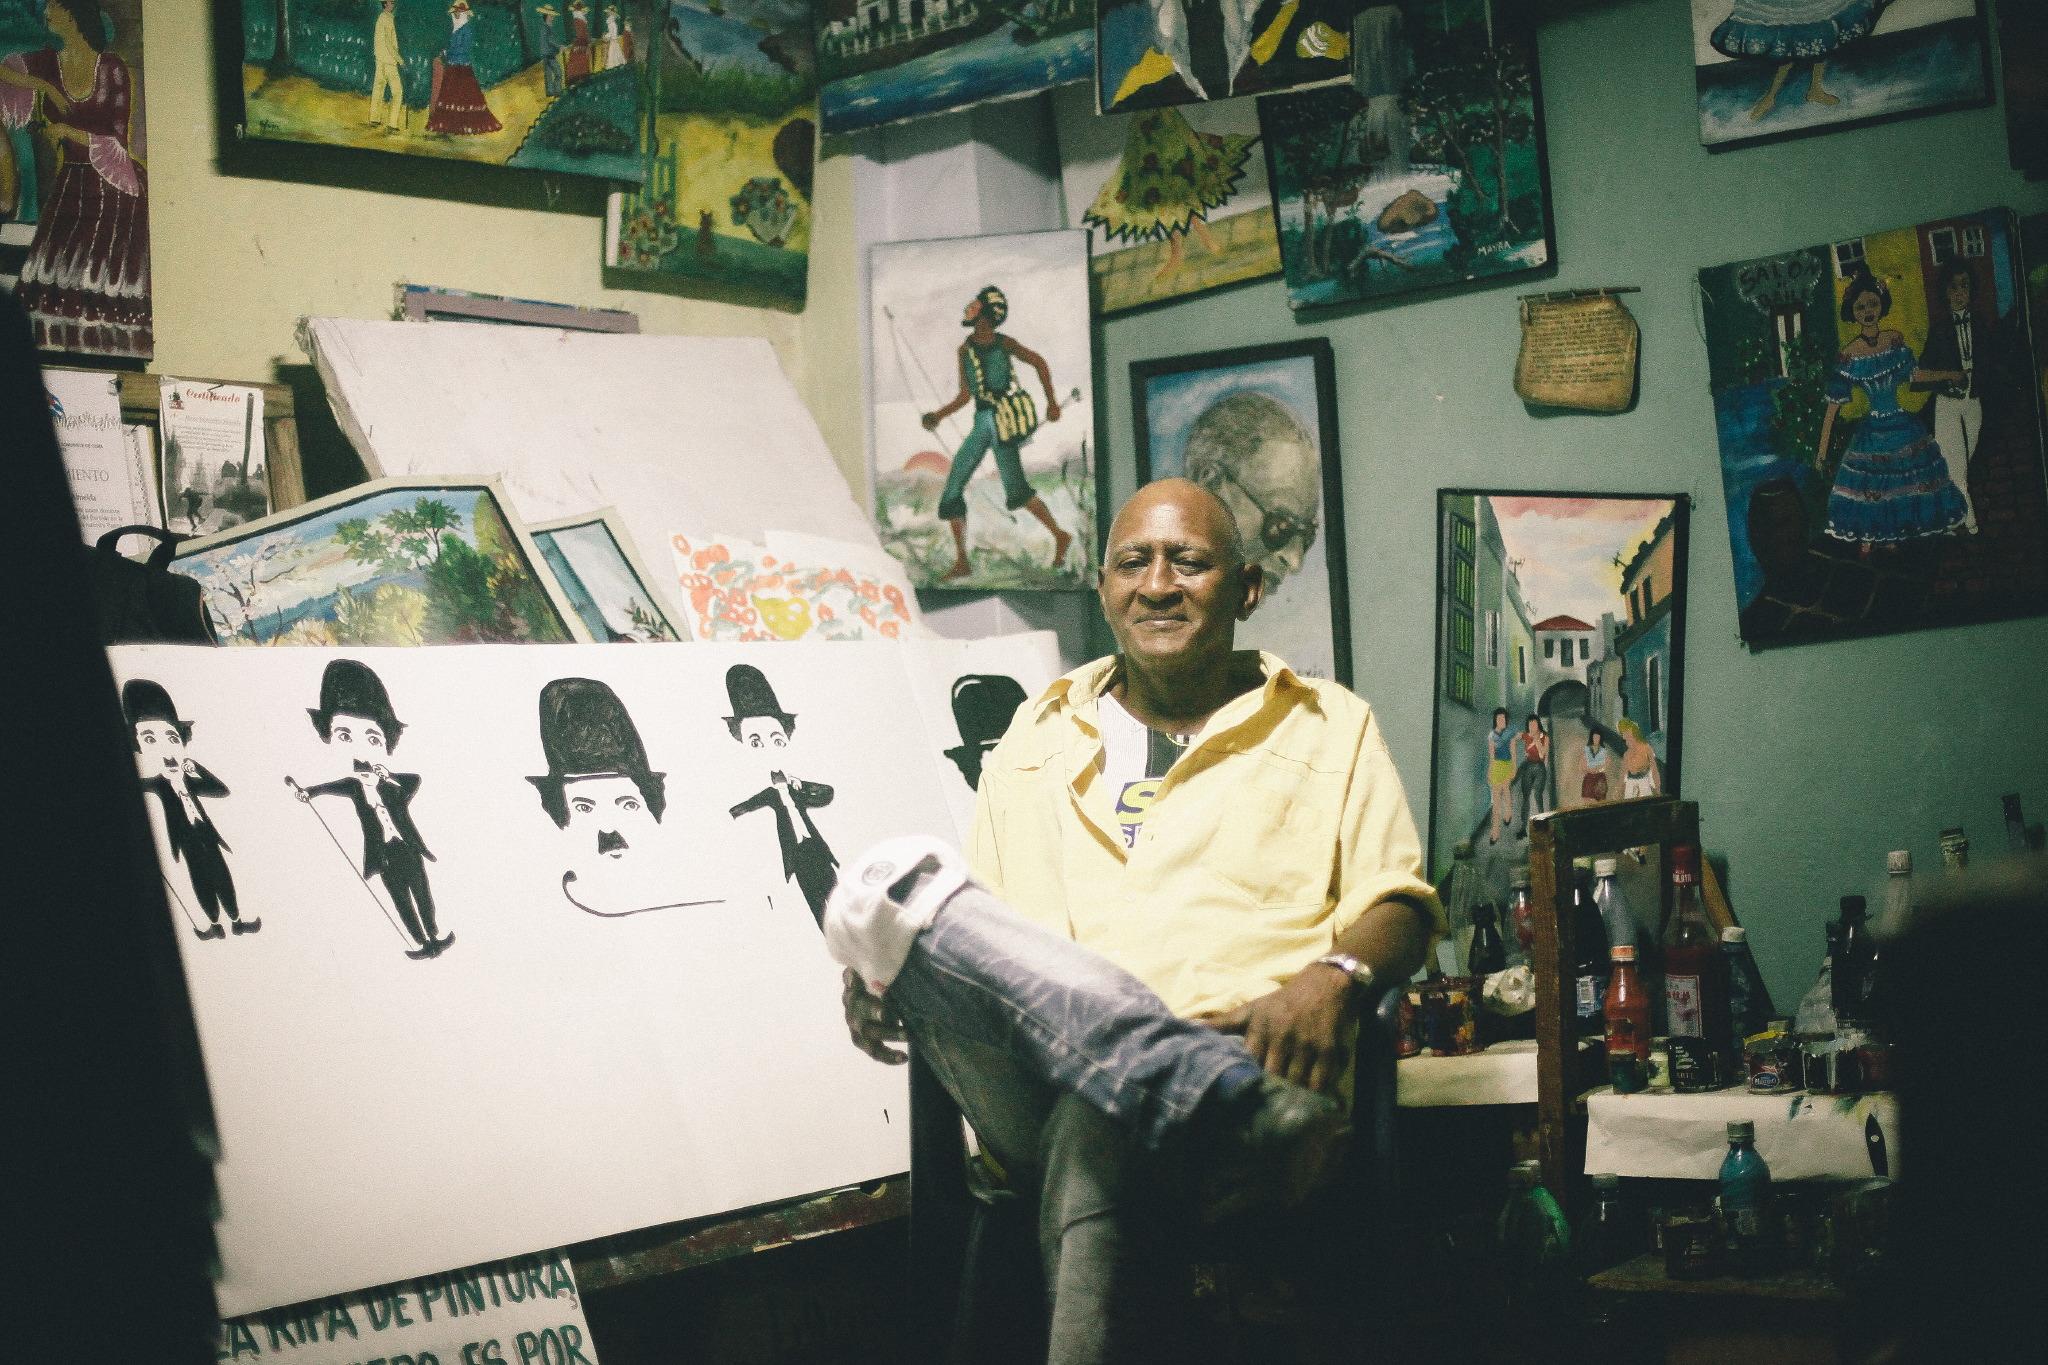 san diego wedding   photographer | artist sitting in front of his work in progress